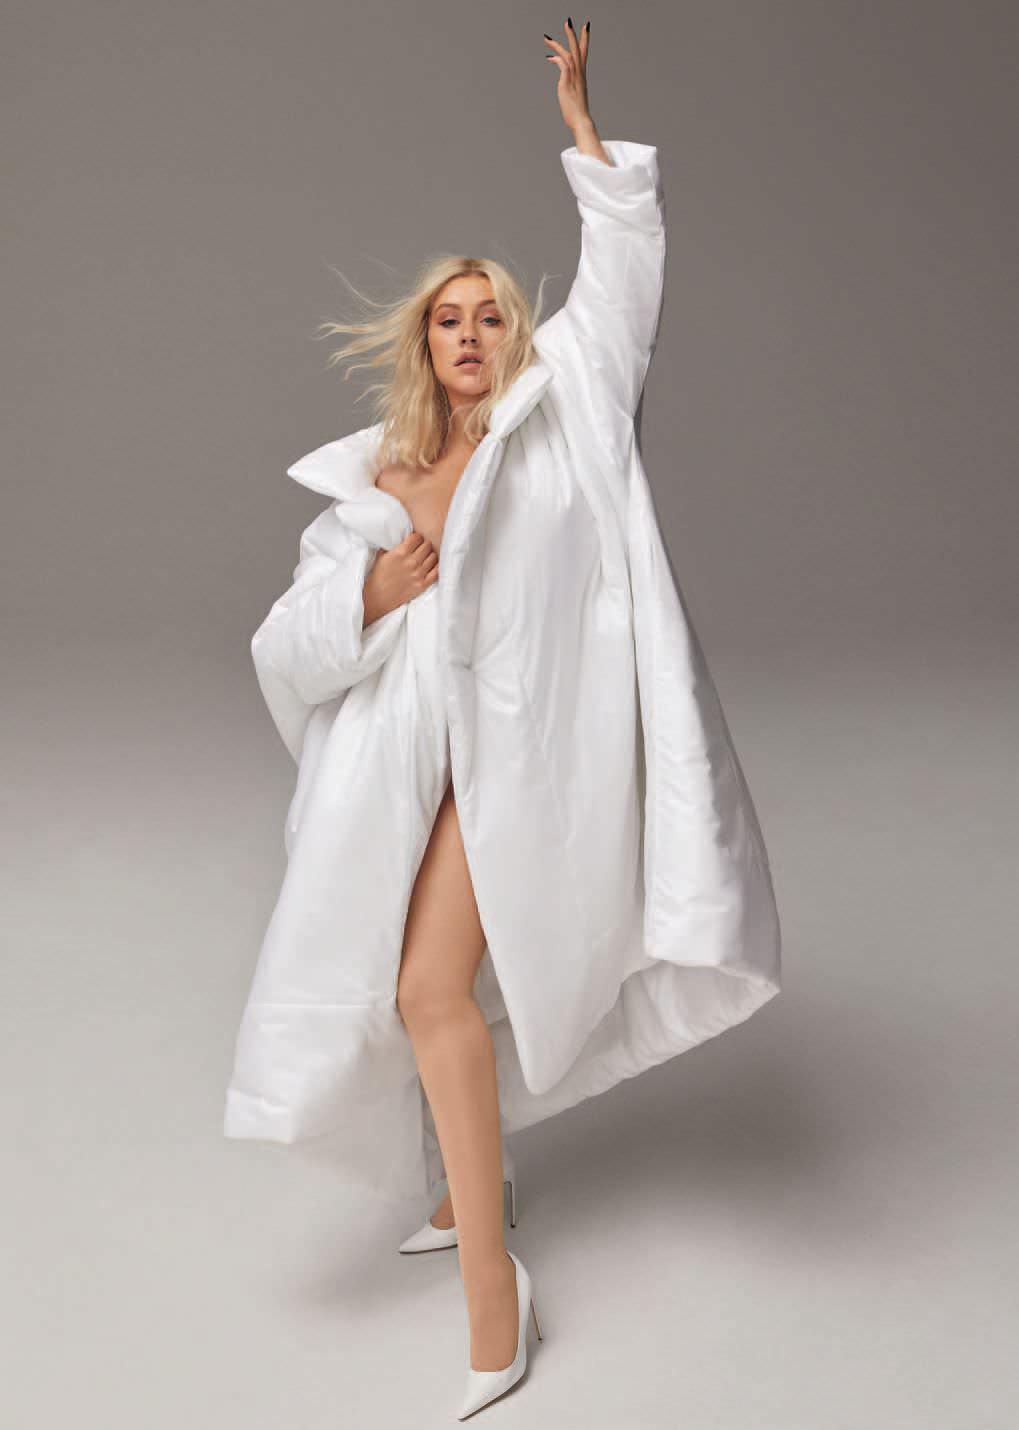 The Liberation Of Christina Aguilera